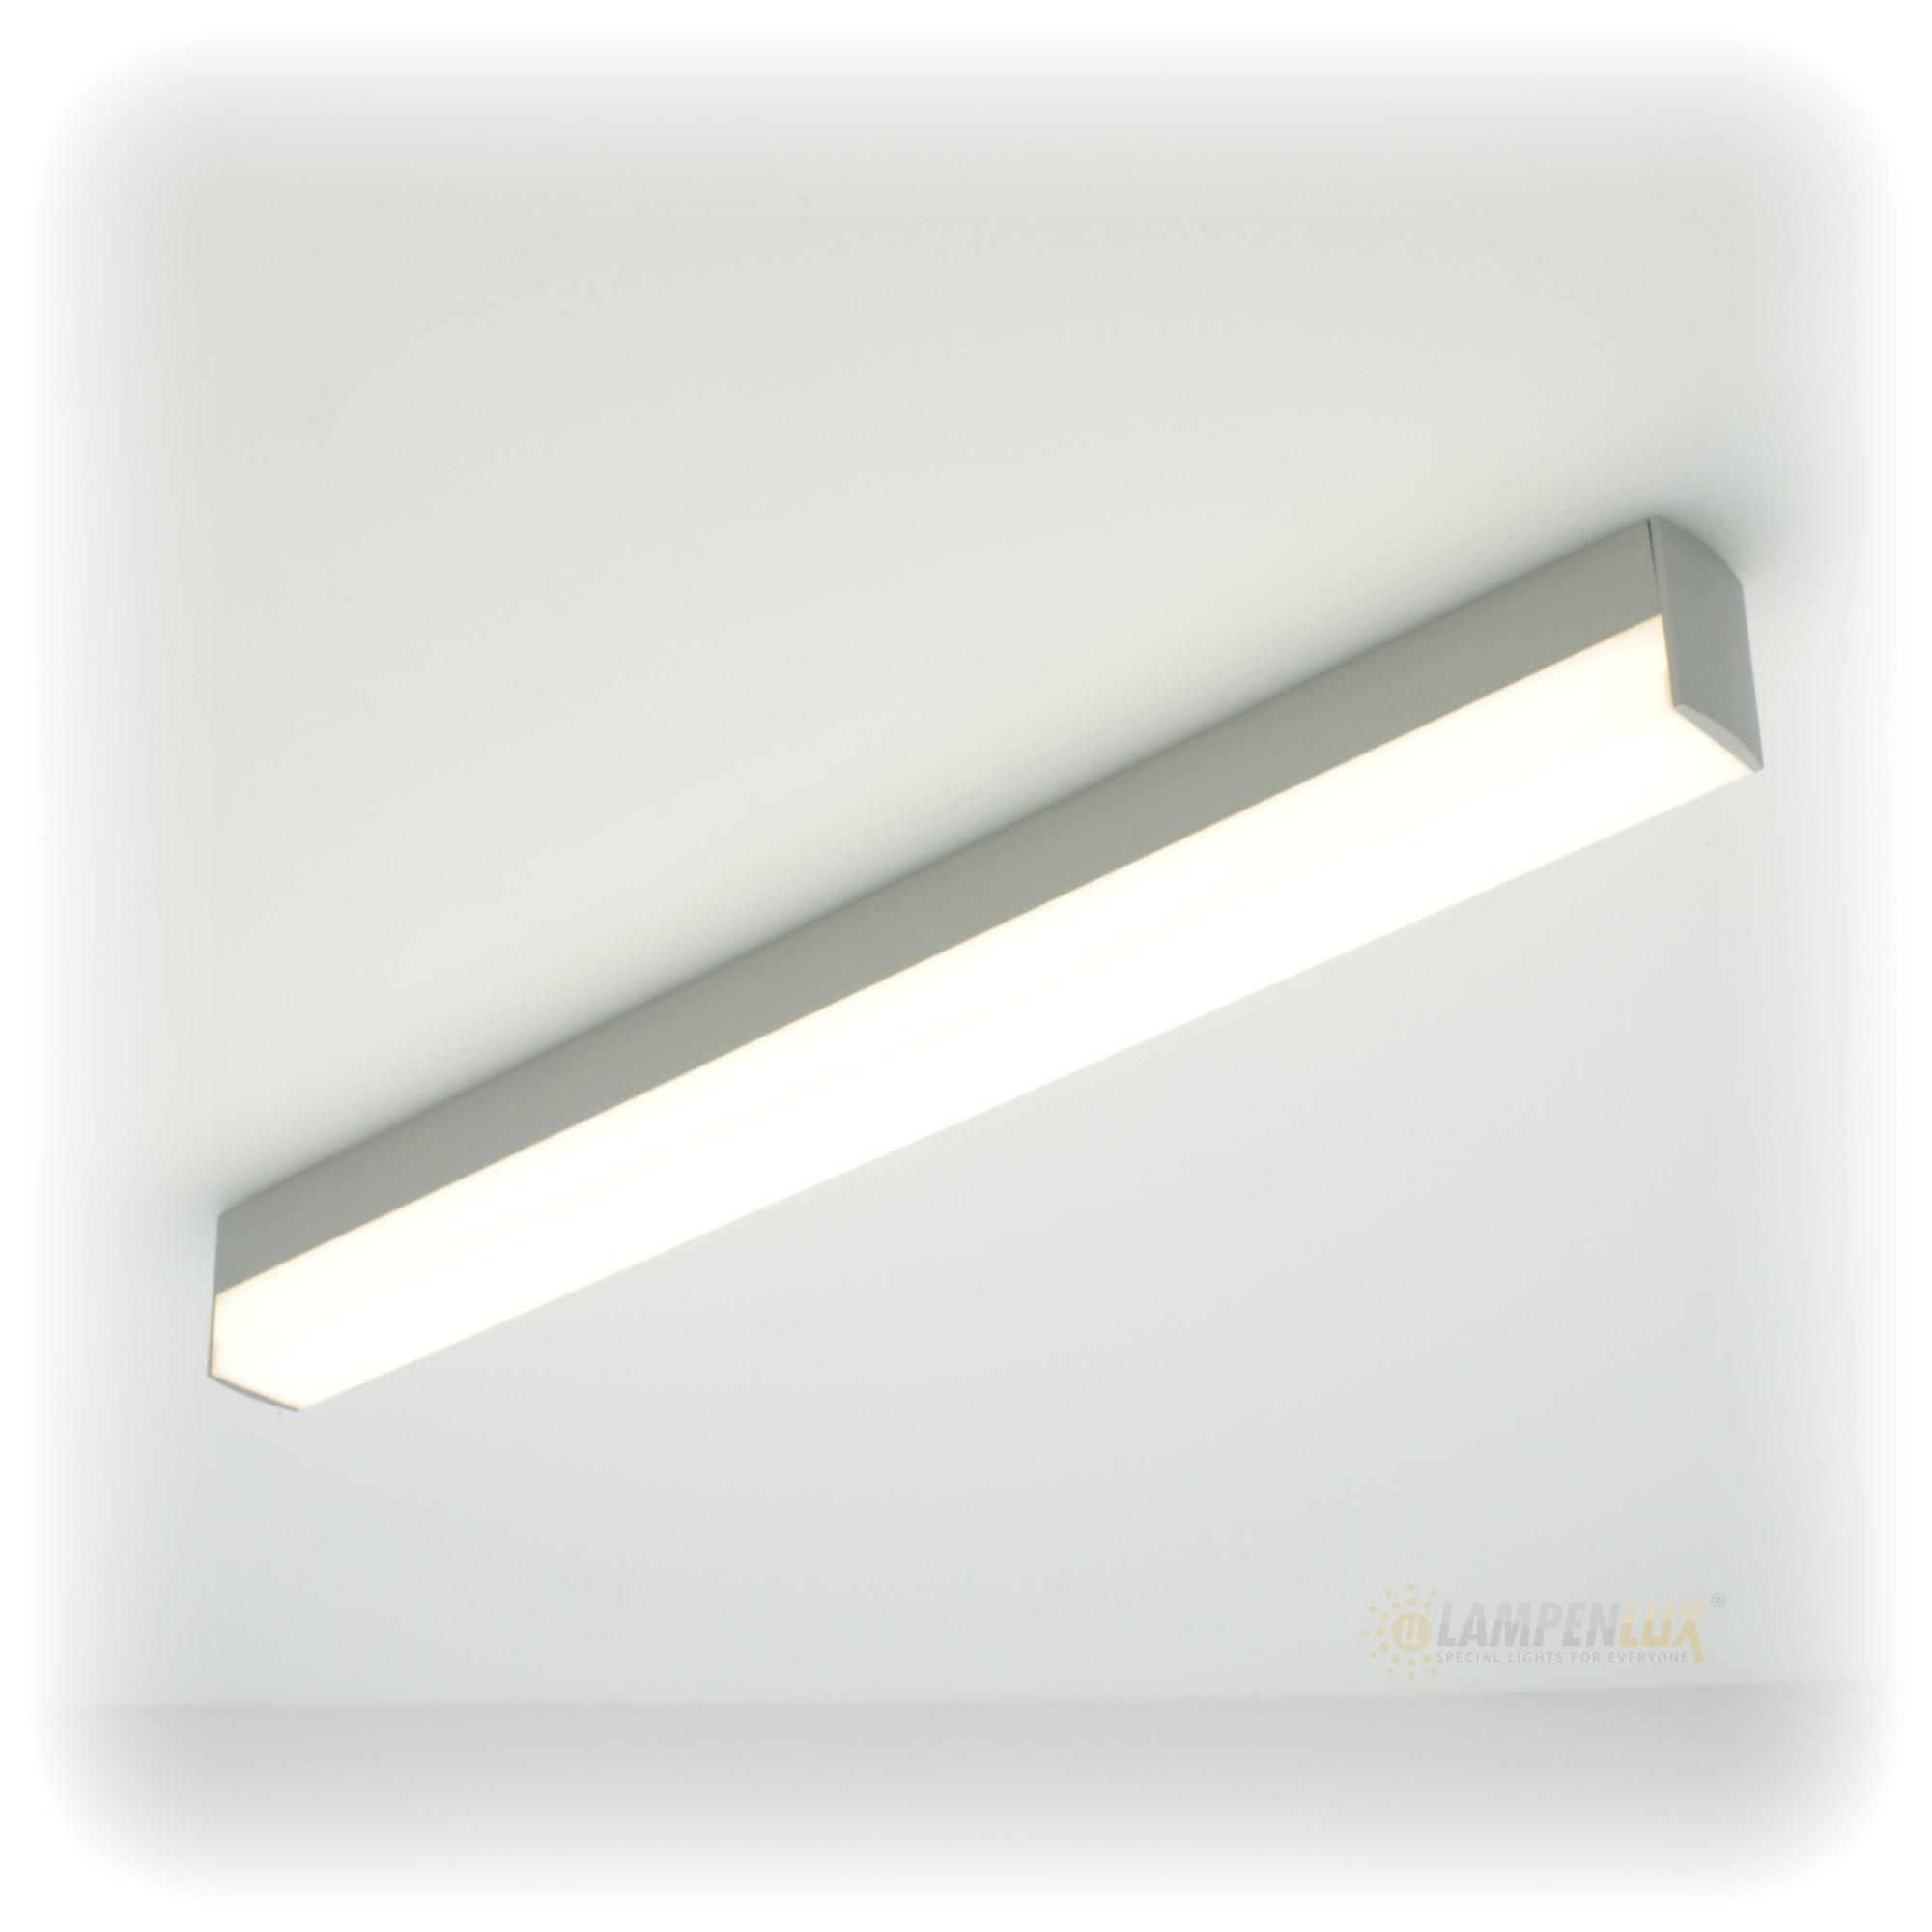 Lampenlux LED Wandlampe Wandleuchte Aaron Badlicht grau LED 60/90/120cm